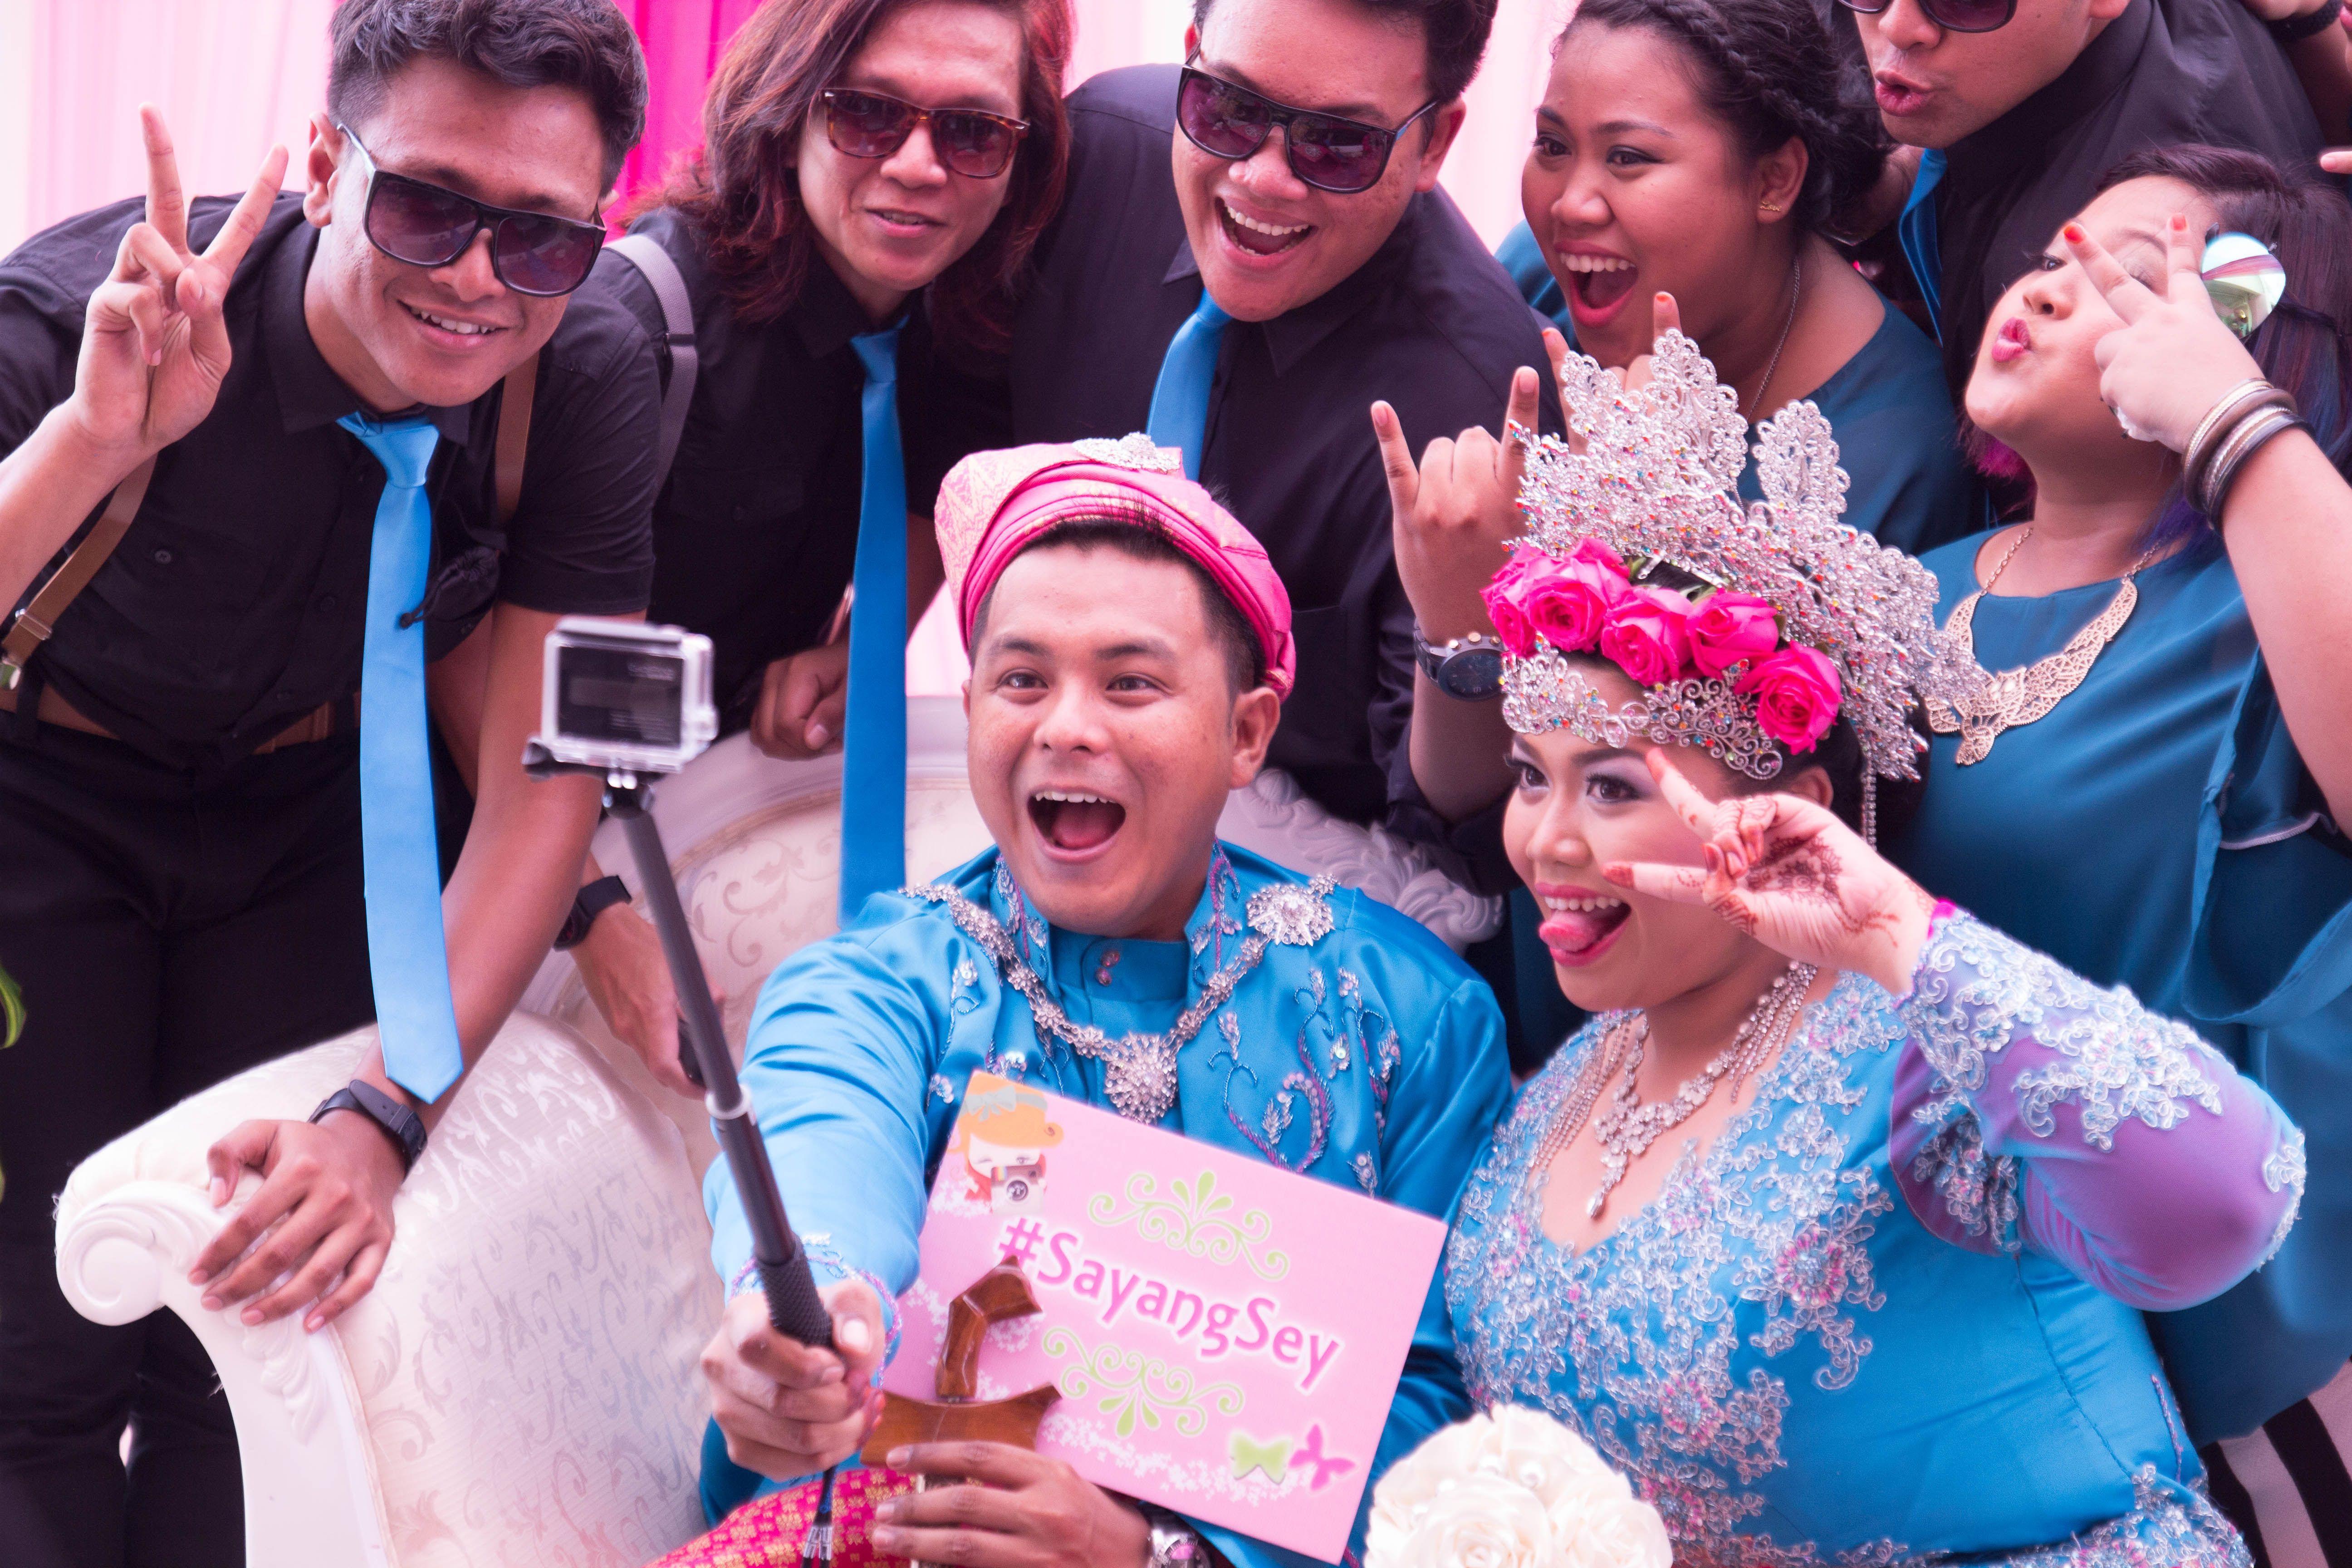 Capturing the selfies, Malay Wedding, 2014